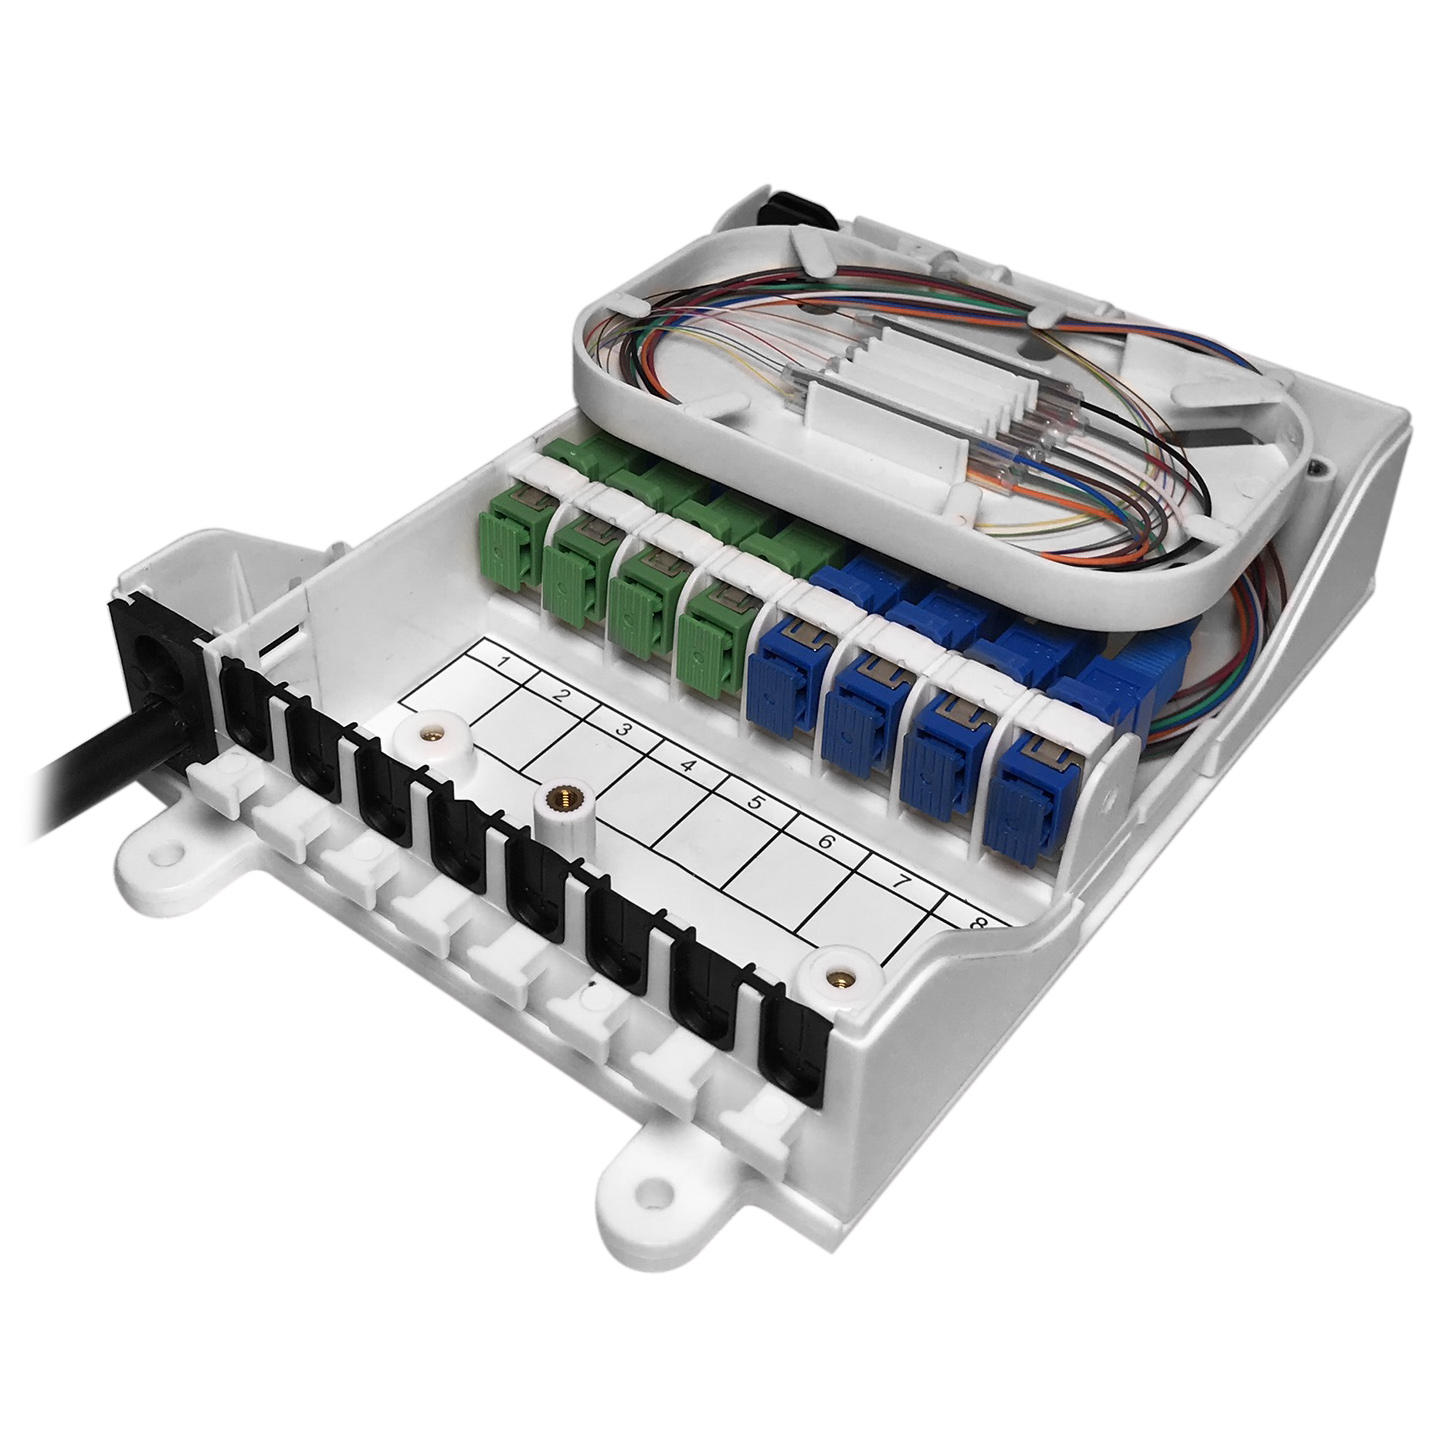 8 Cores Fiber Optic Termination Box